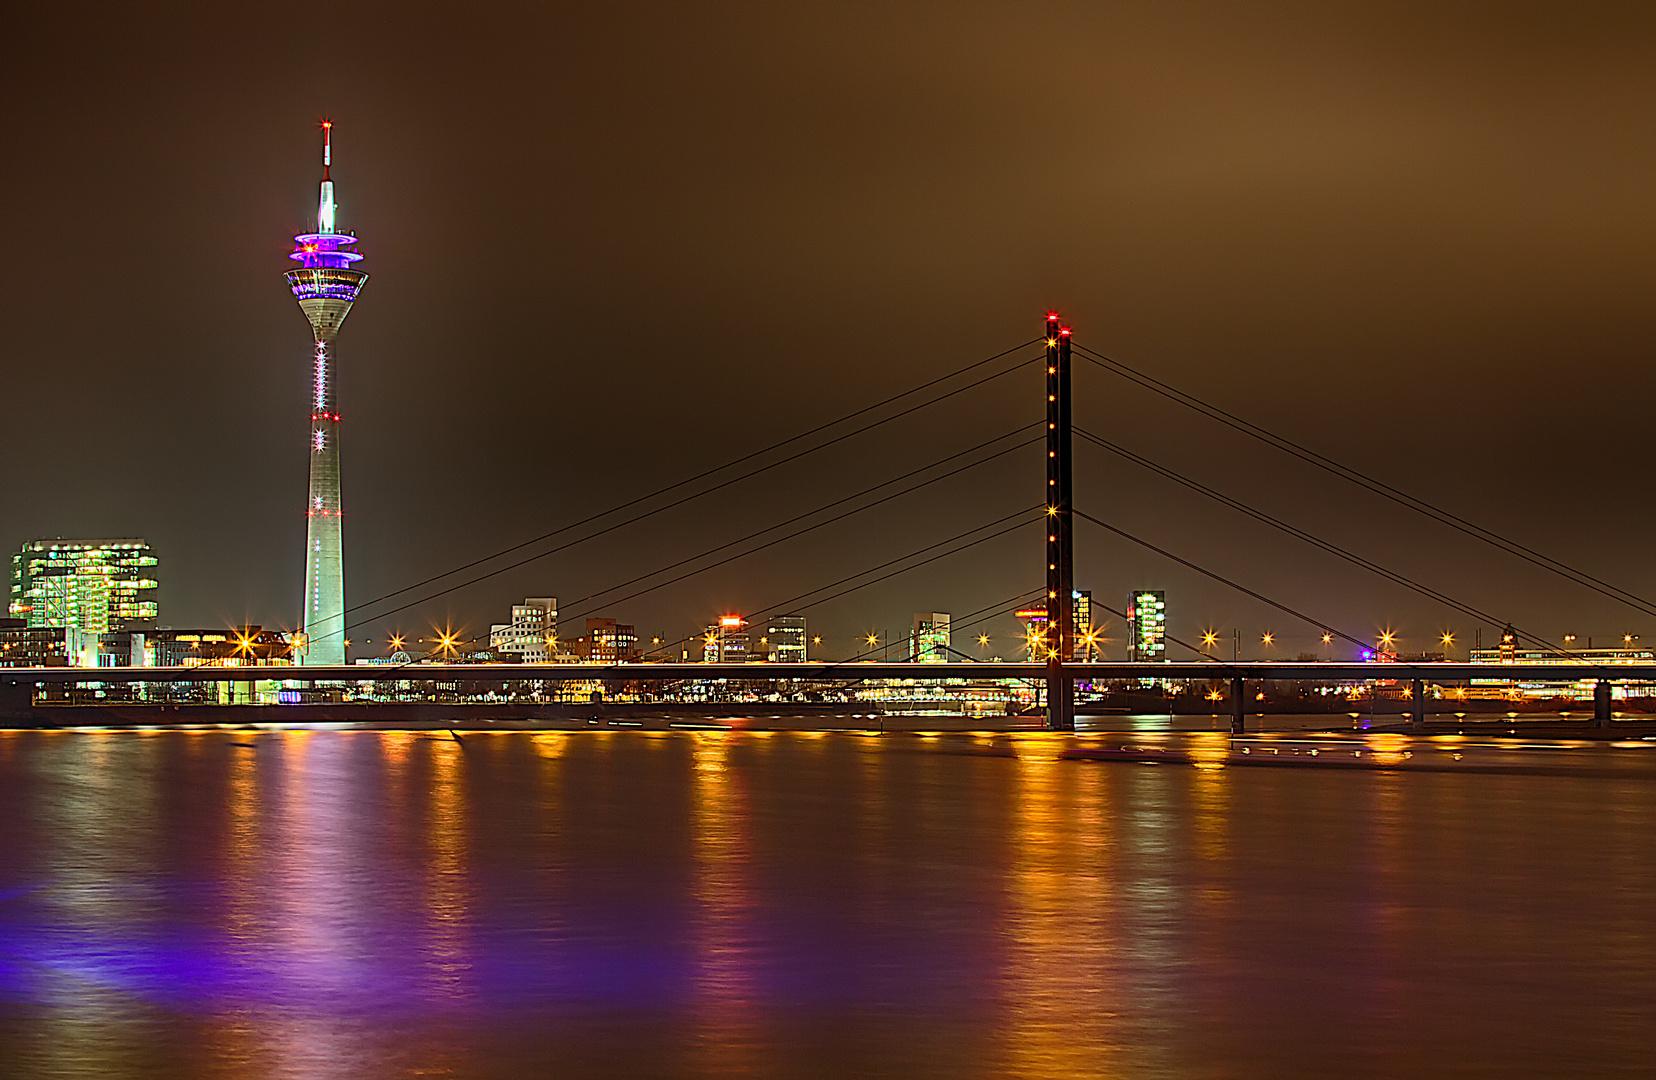 Rheinturm mit Rheinbrücke